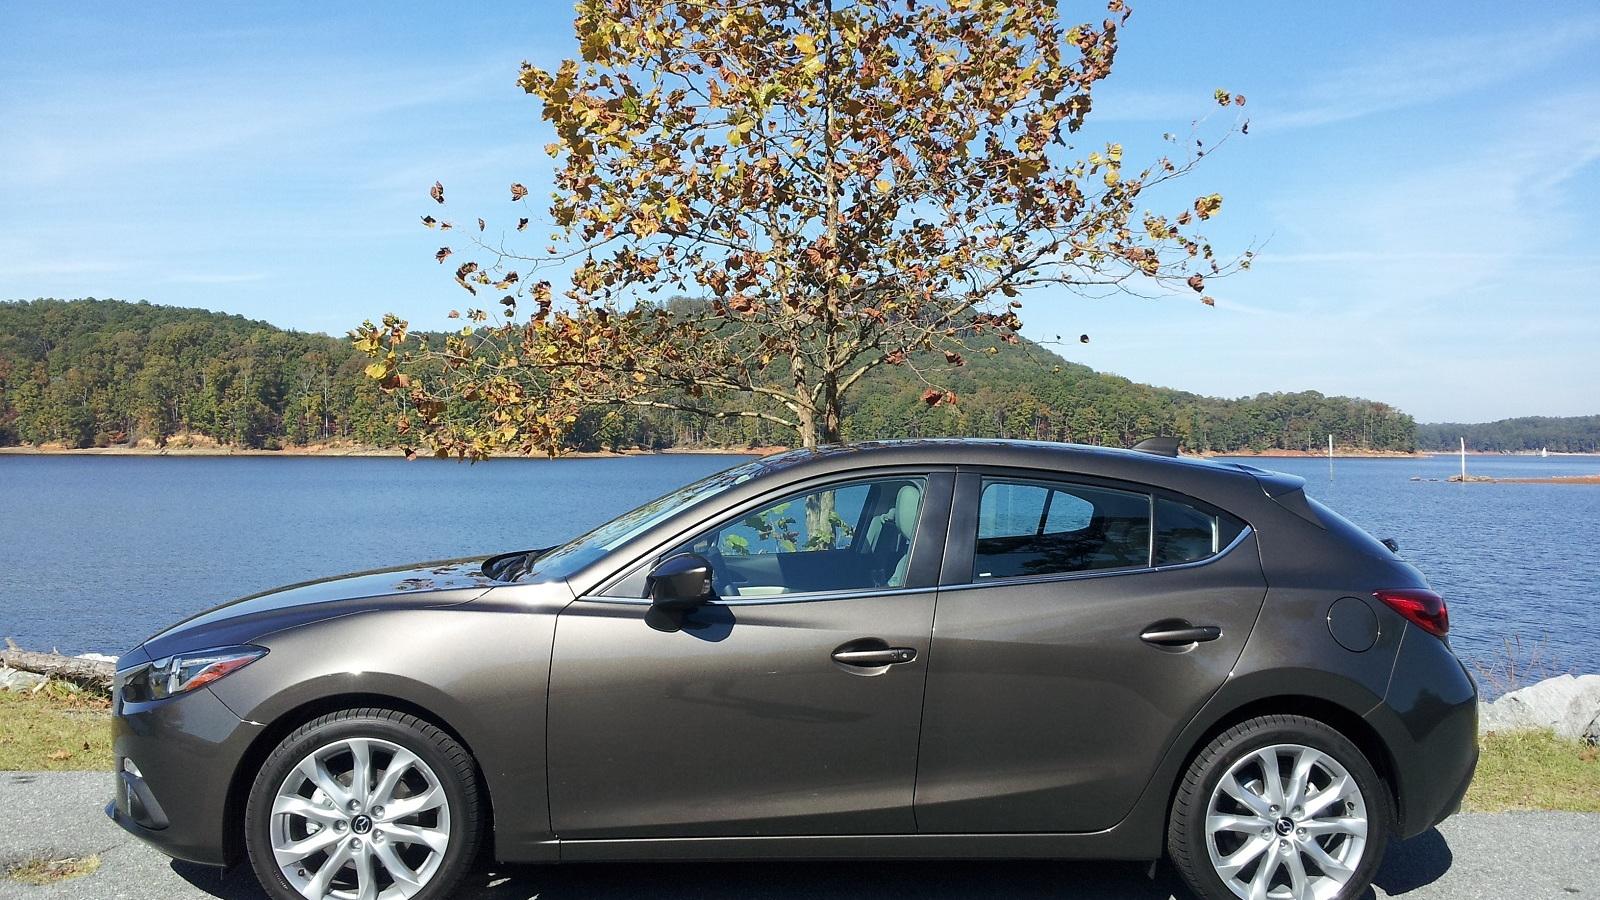 2014 Mazda 3, test drive, Atlanta region, Oct 2013